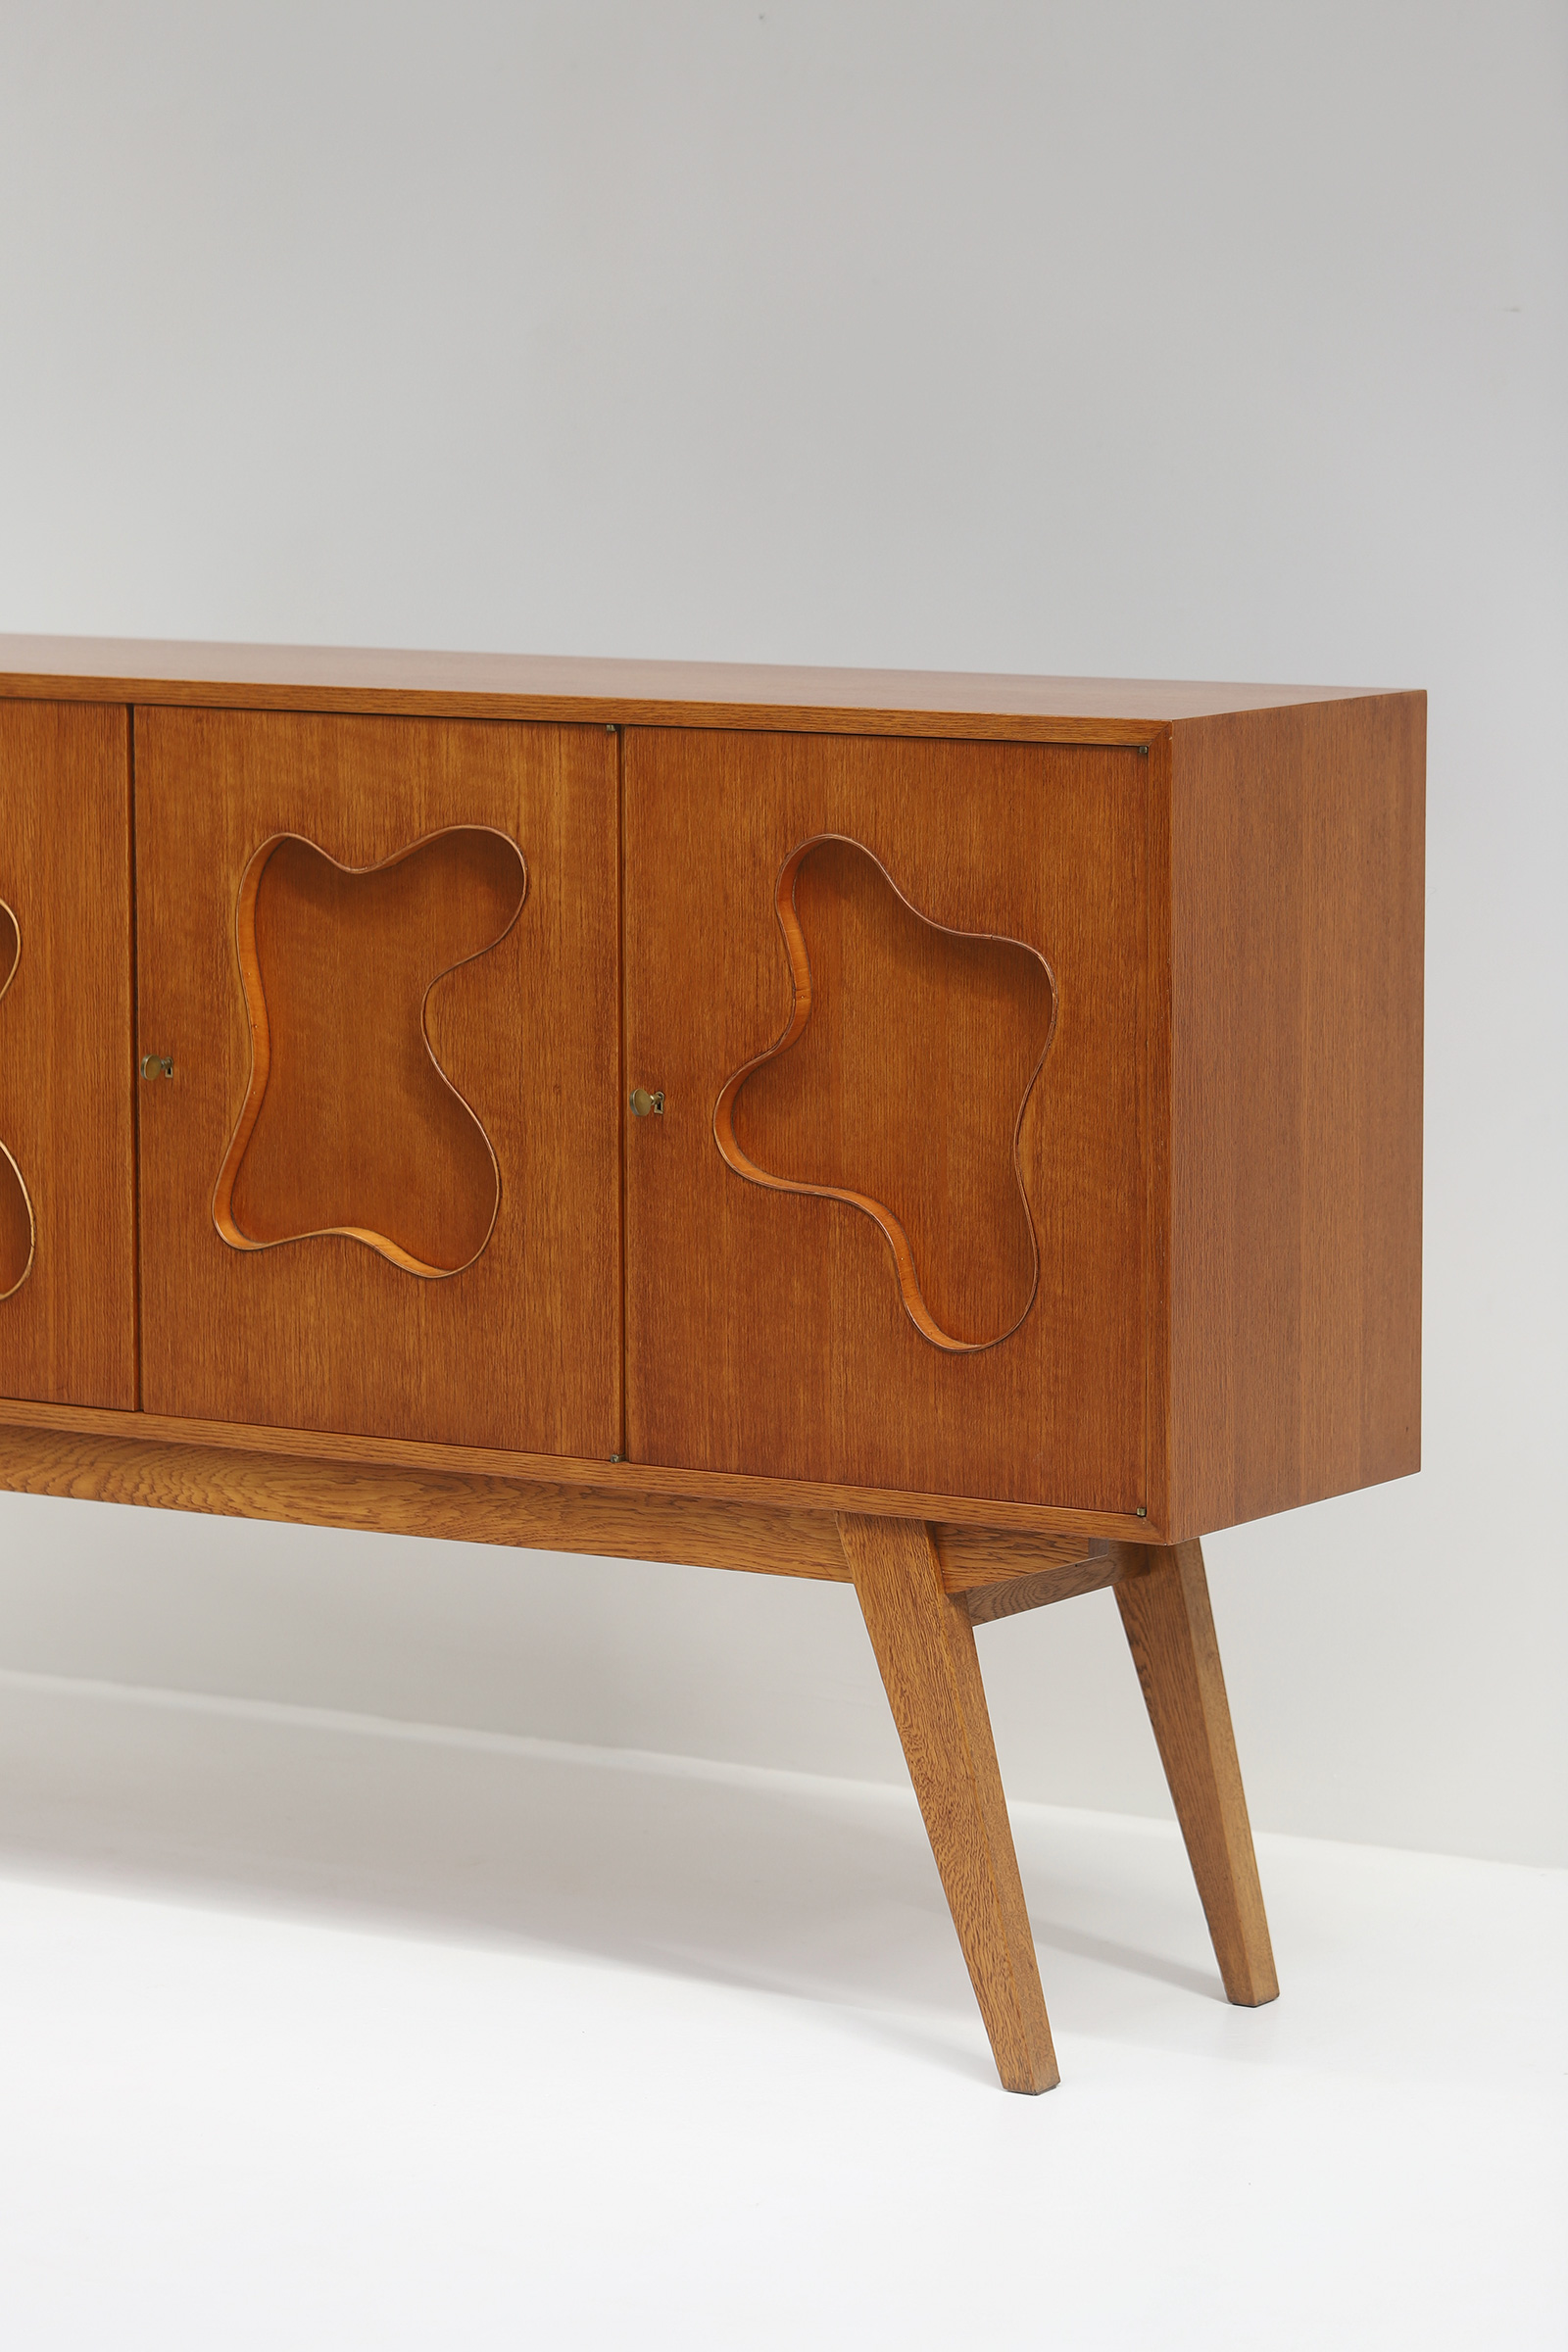 1950s Oak sideboard Free form Shaped Doors image 16